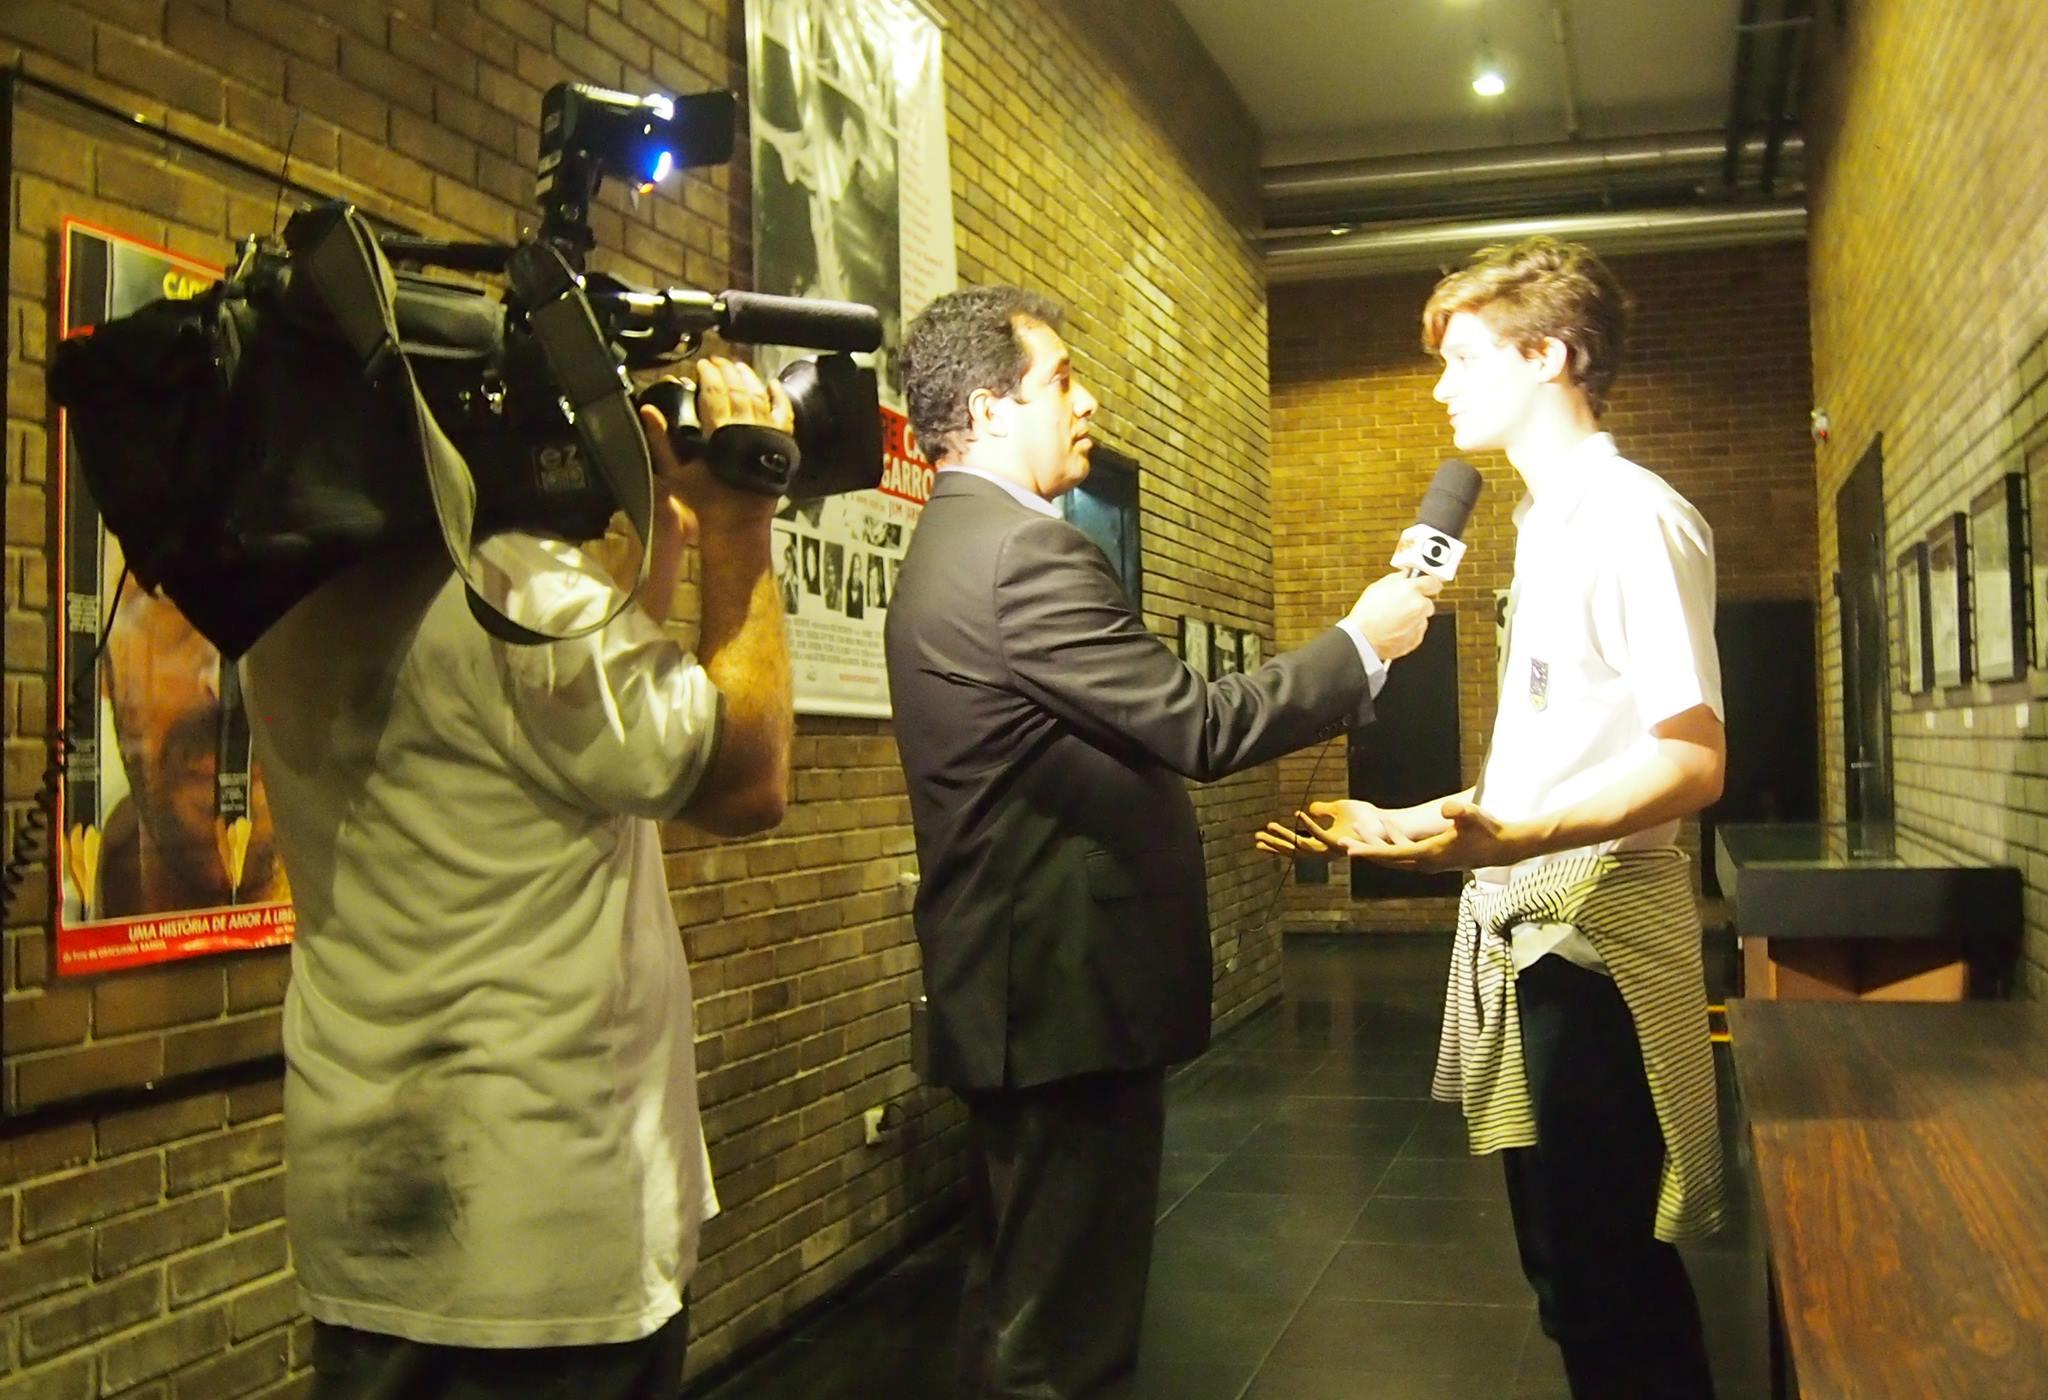 Andre Trigueiro - GloboNews at Uranium Film Festival MAM Rio